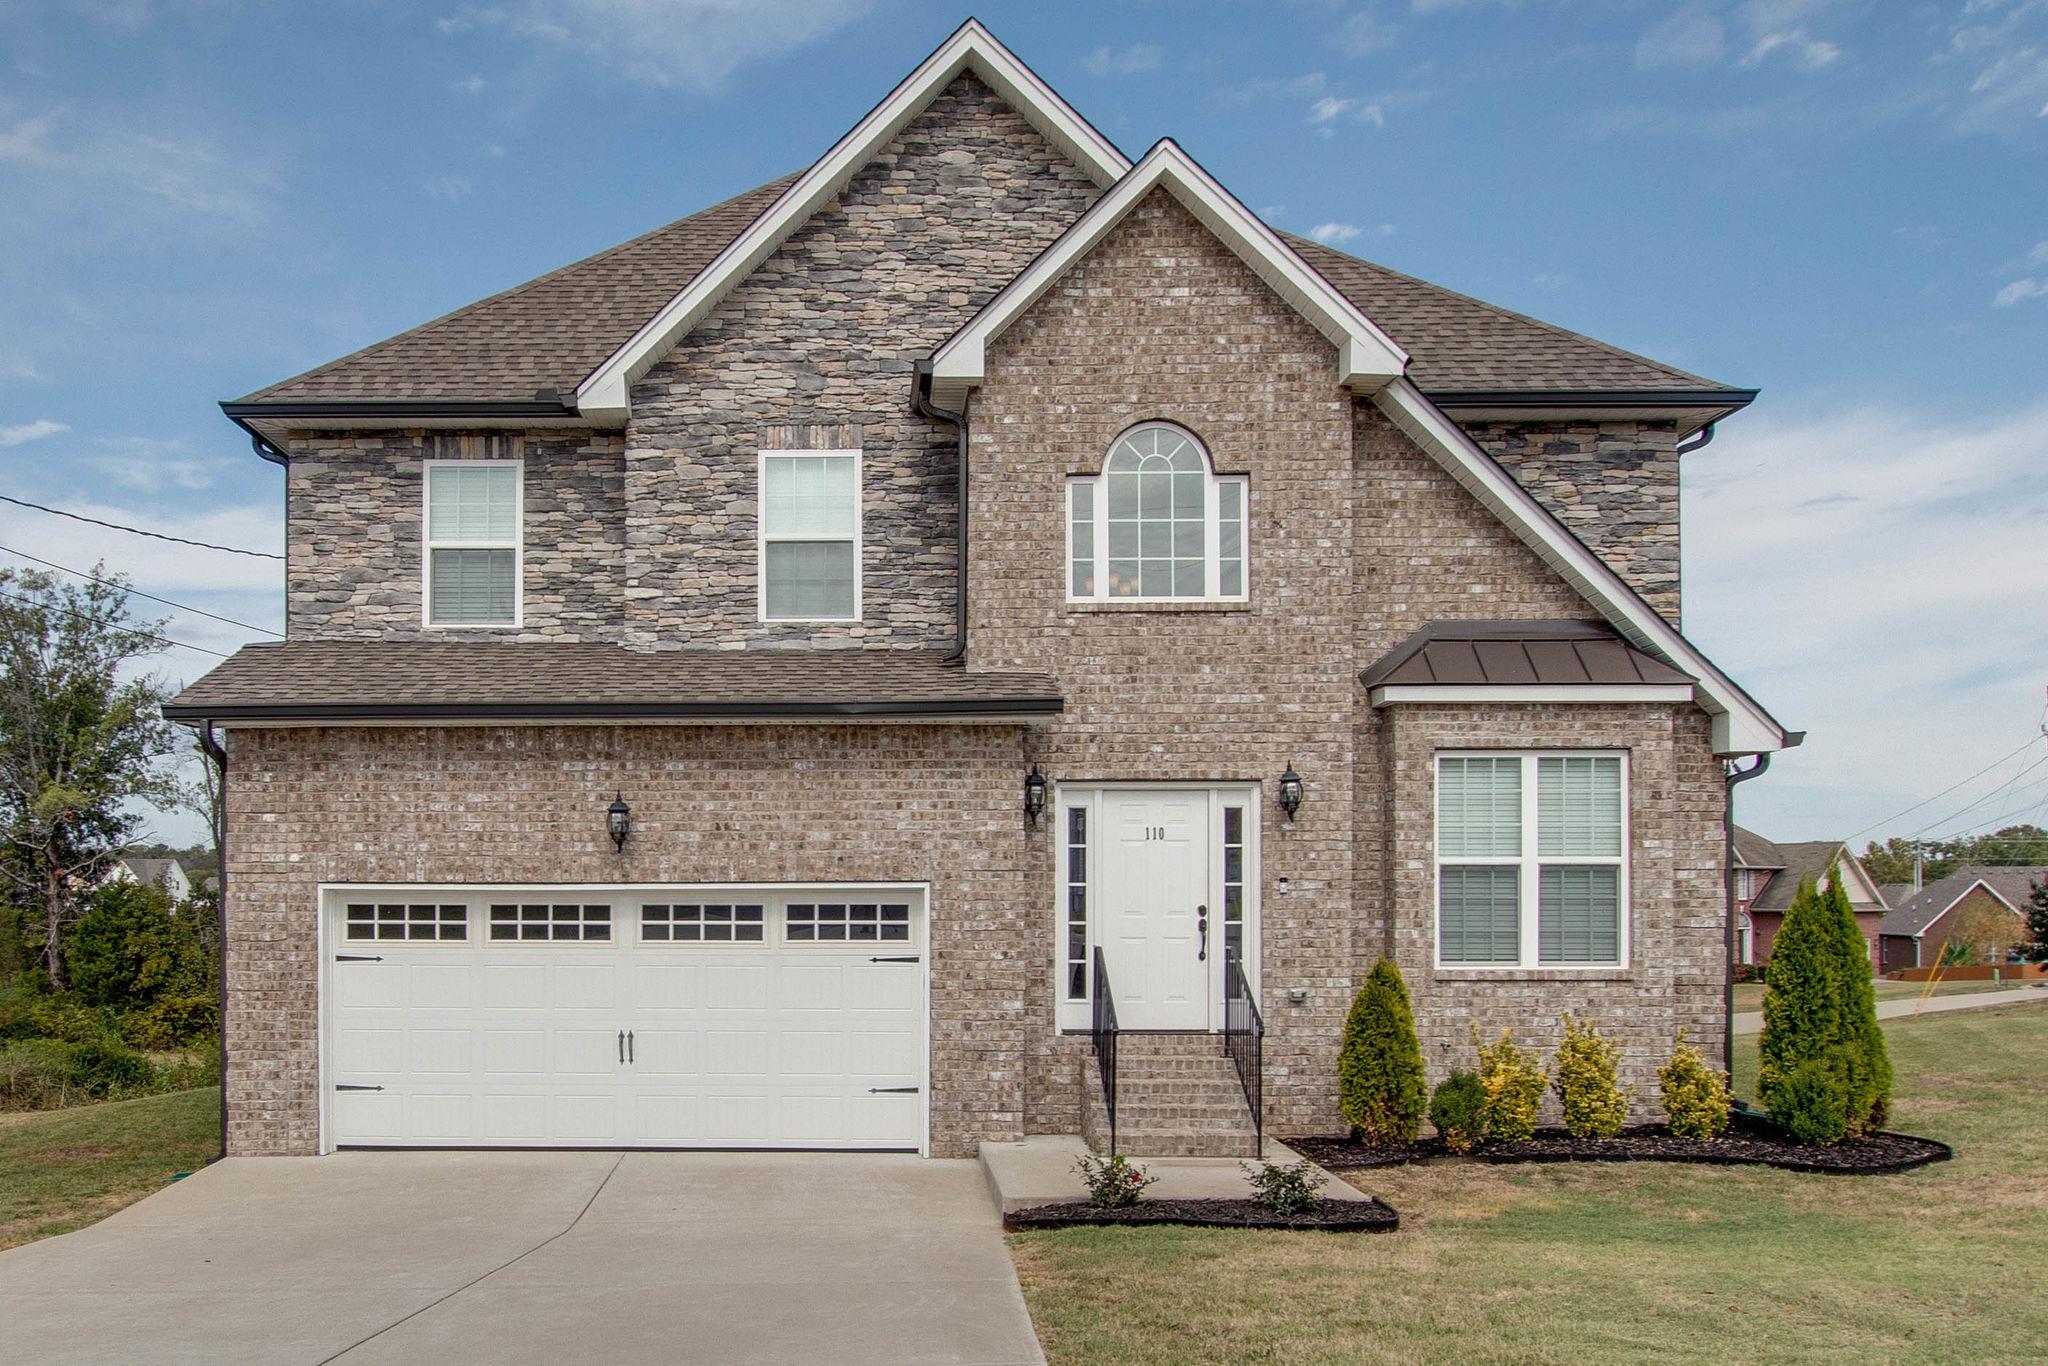 110 Shrike Ct, LA VERGNE, TN 37086 - LA VERGNE, TN real estate listing